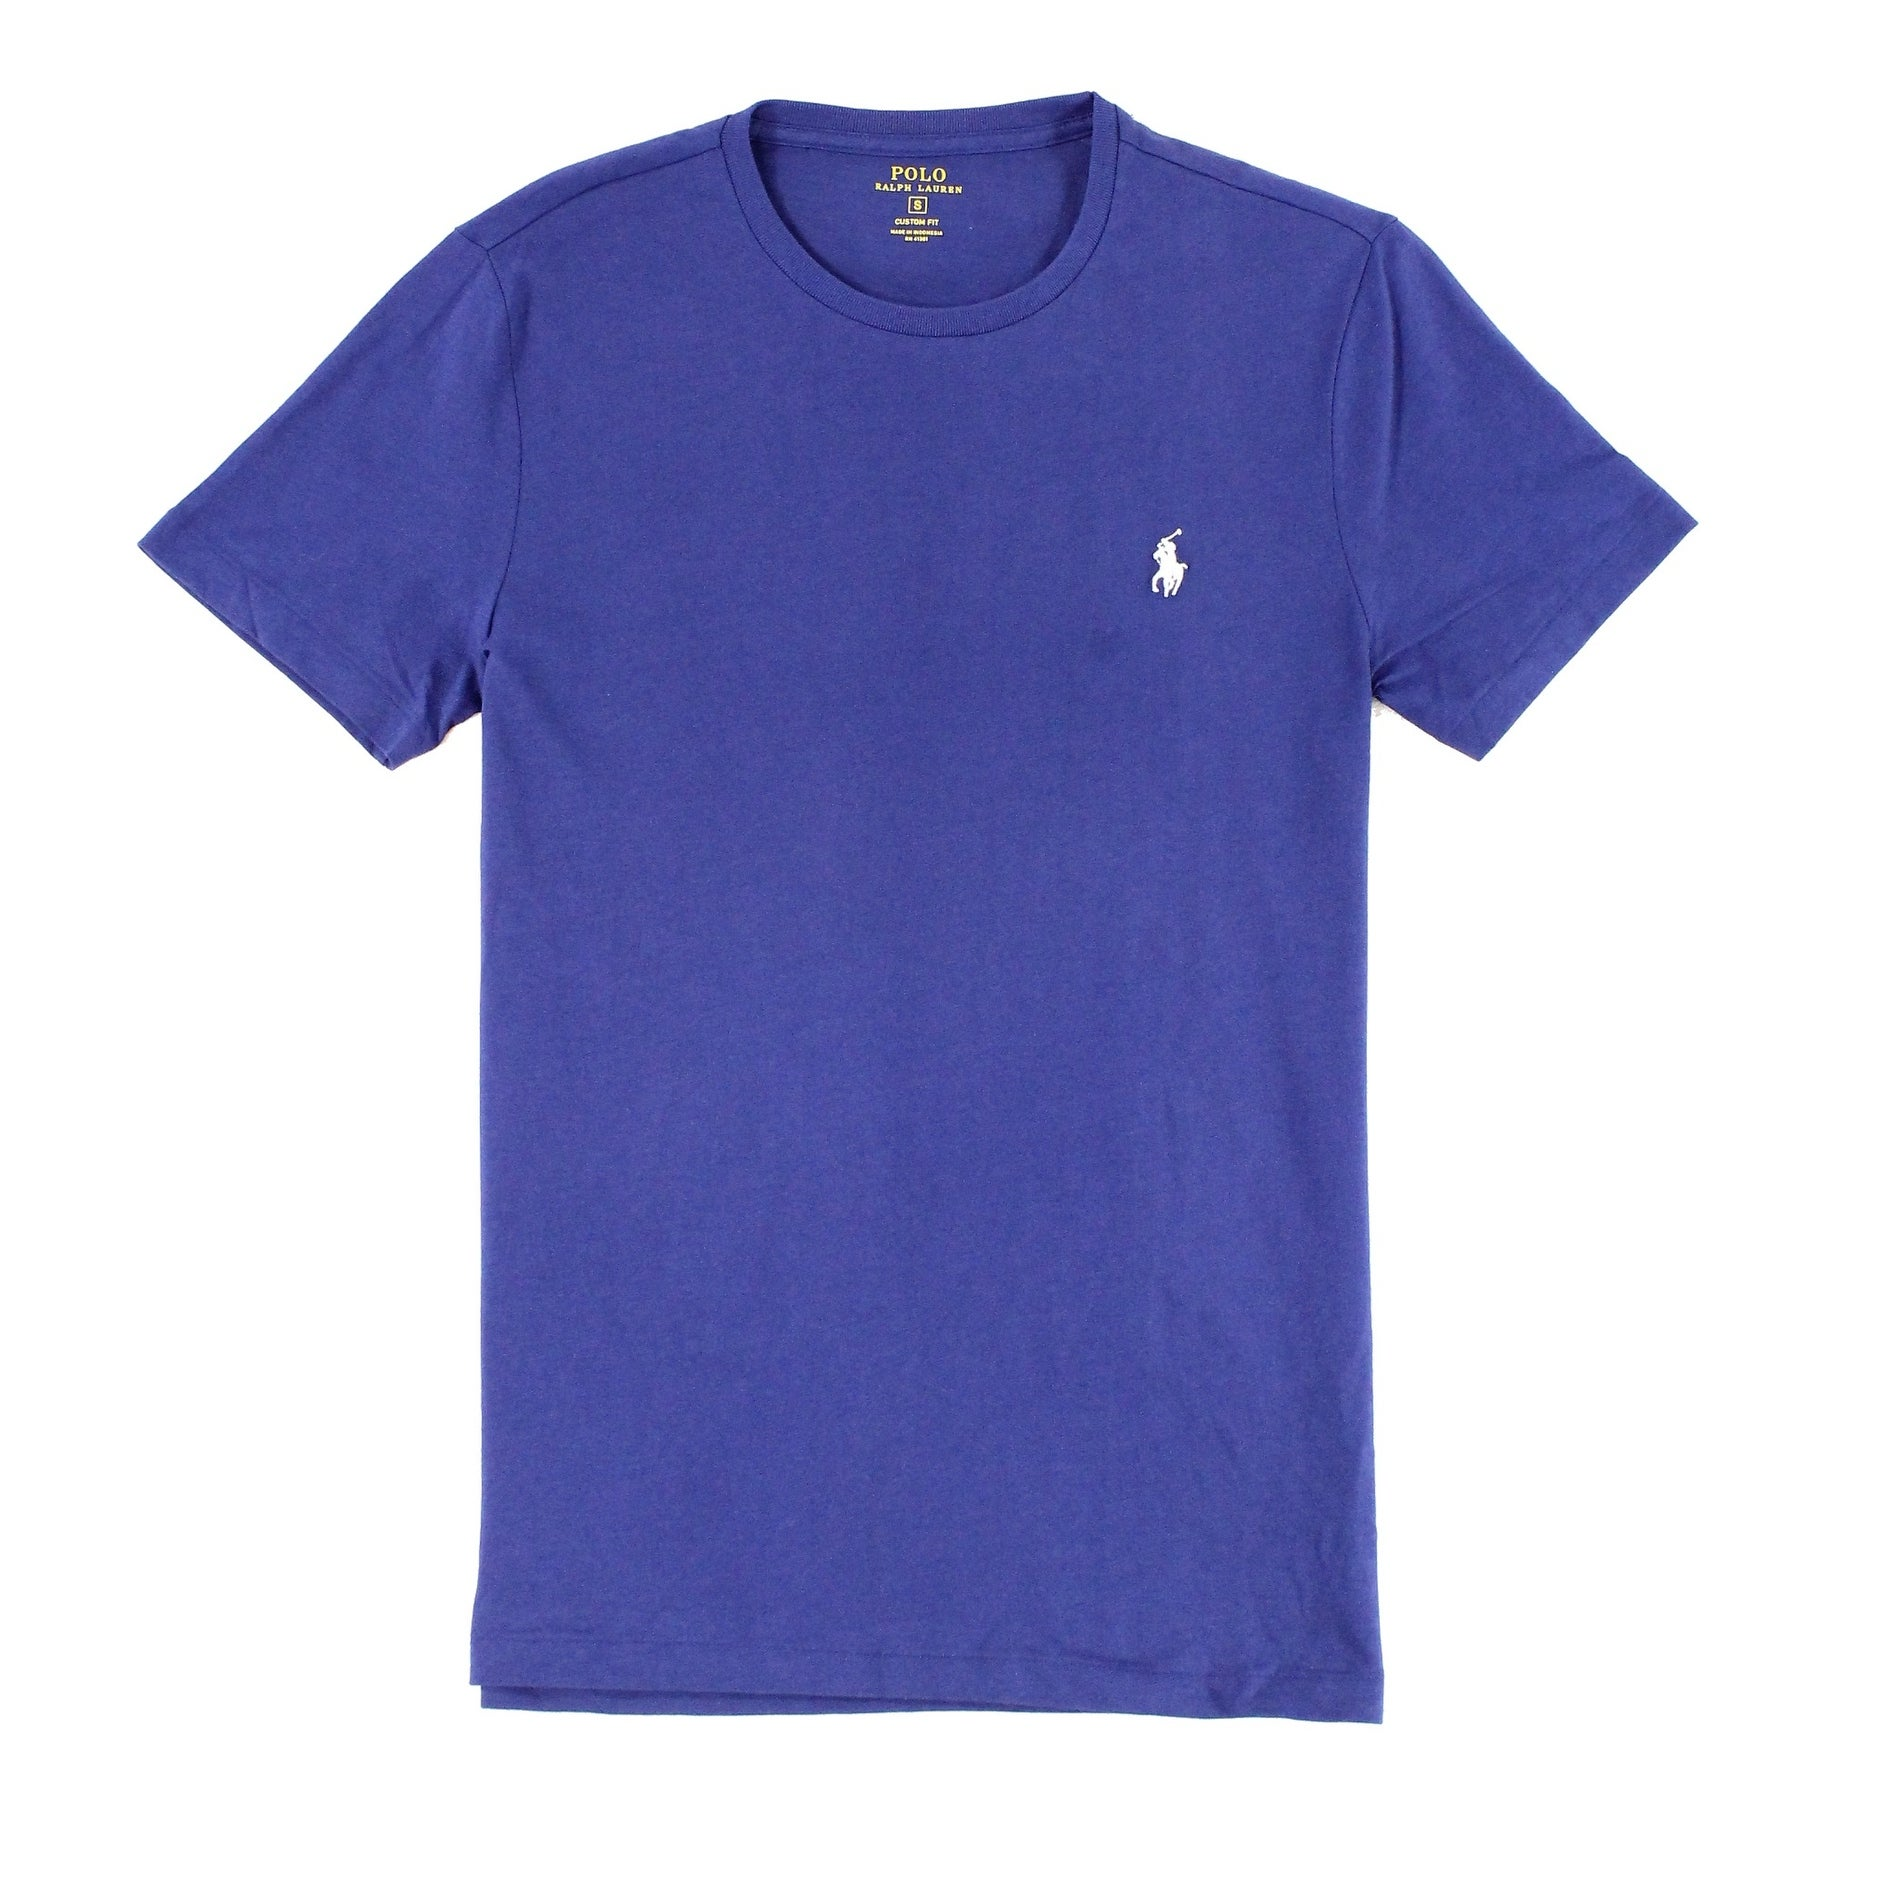 bfce18068 Polo Ralph Lauren Custom Fit Dress Shirt Blue – EDGE Engineering and ...